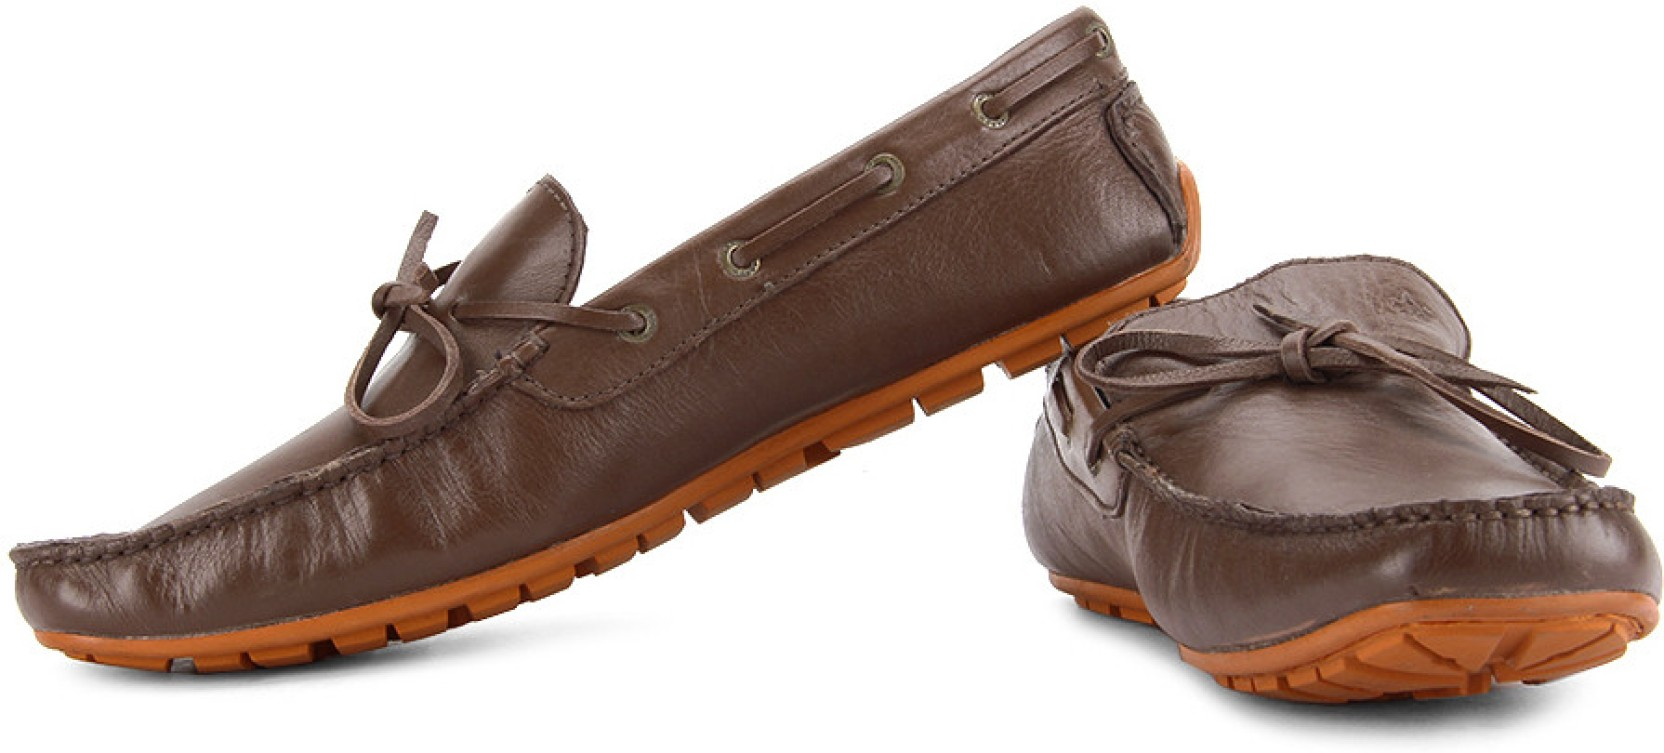 Arrow Denial Loafers - Buy Brown Color Arrow Denial Loafers Online At Best Price - Shop Online ...